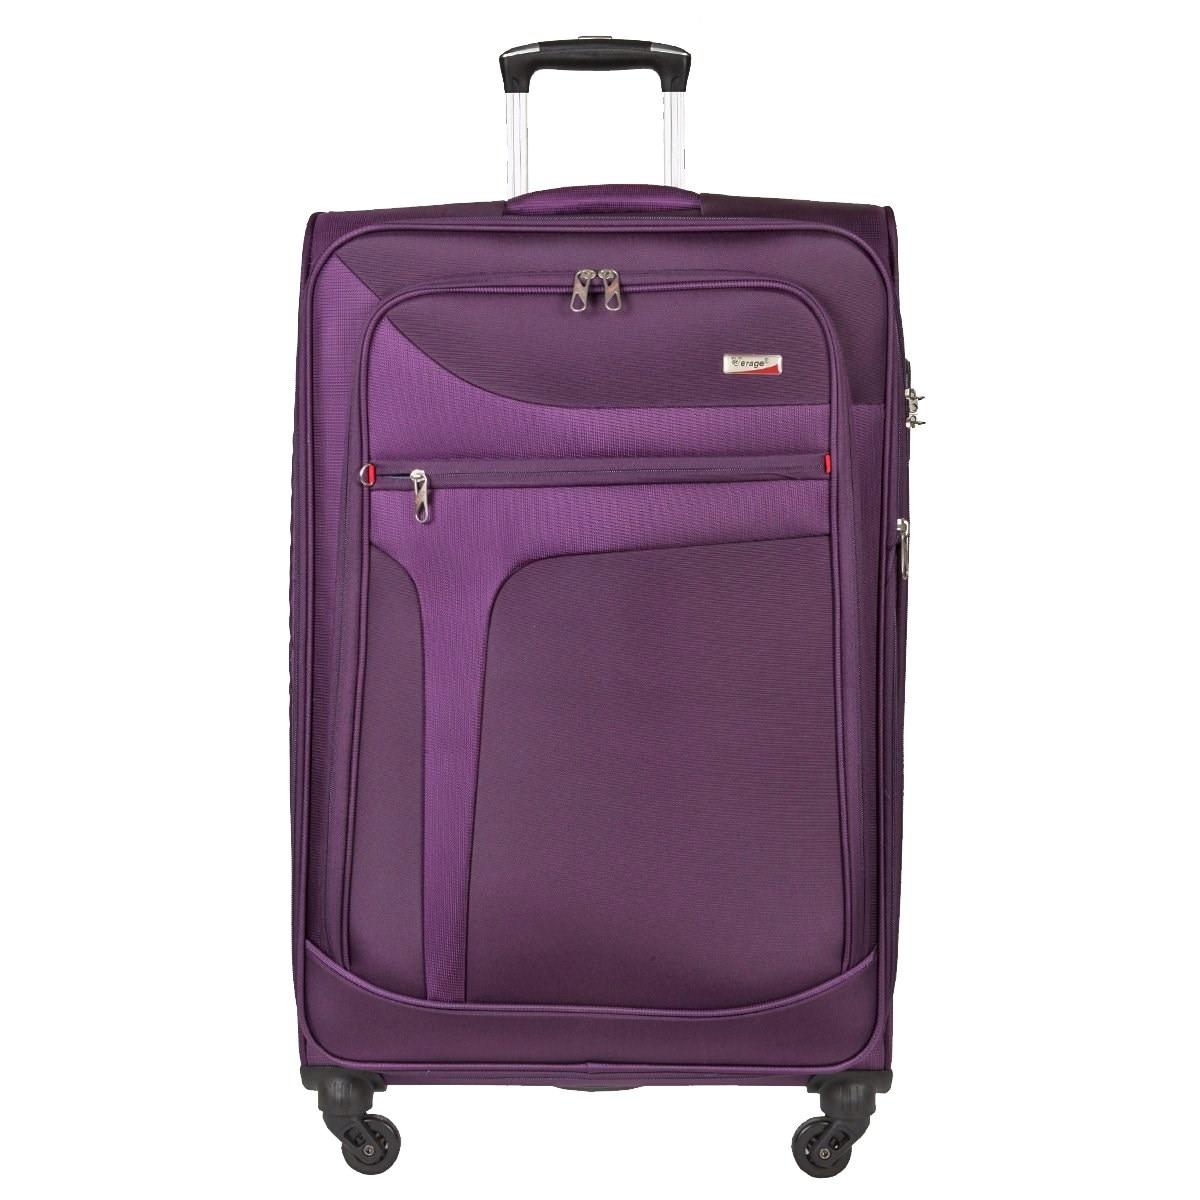 Suitcase-trolley Verage GM14086W28 purple